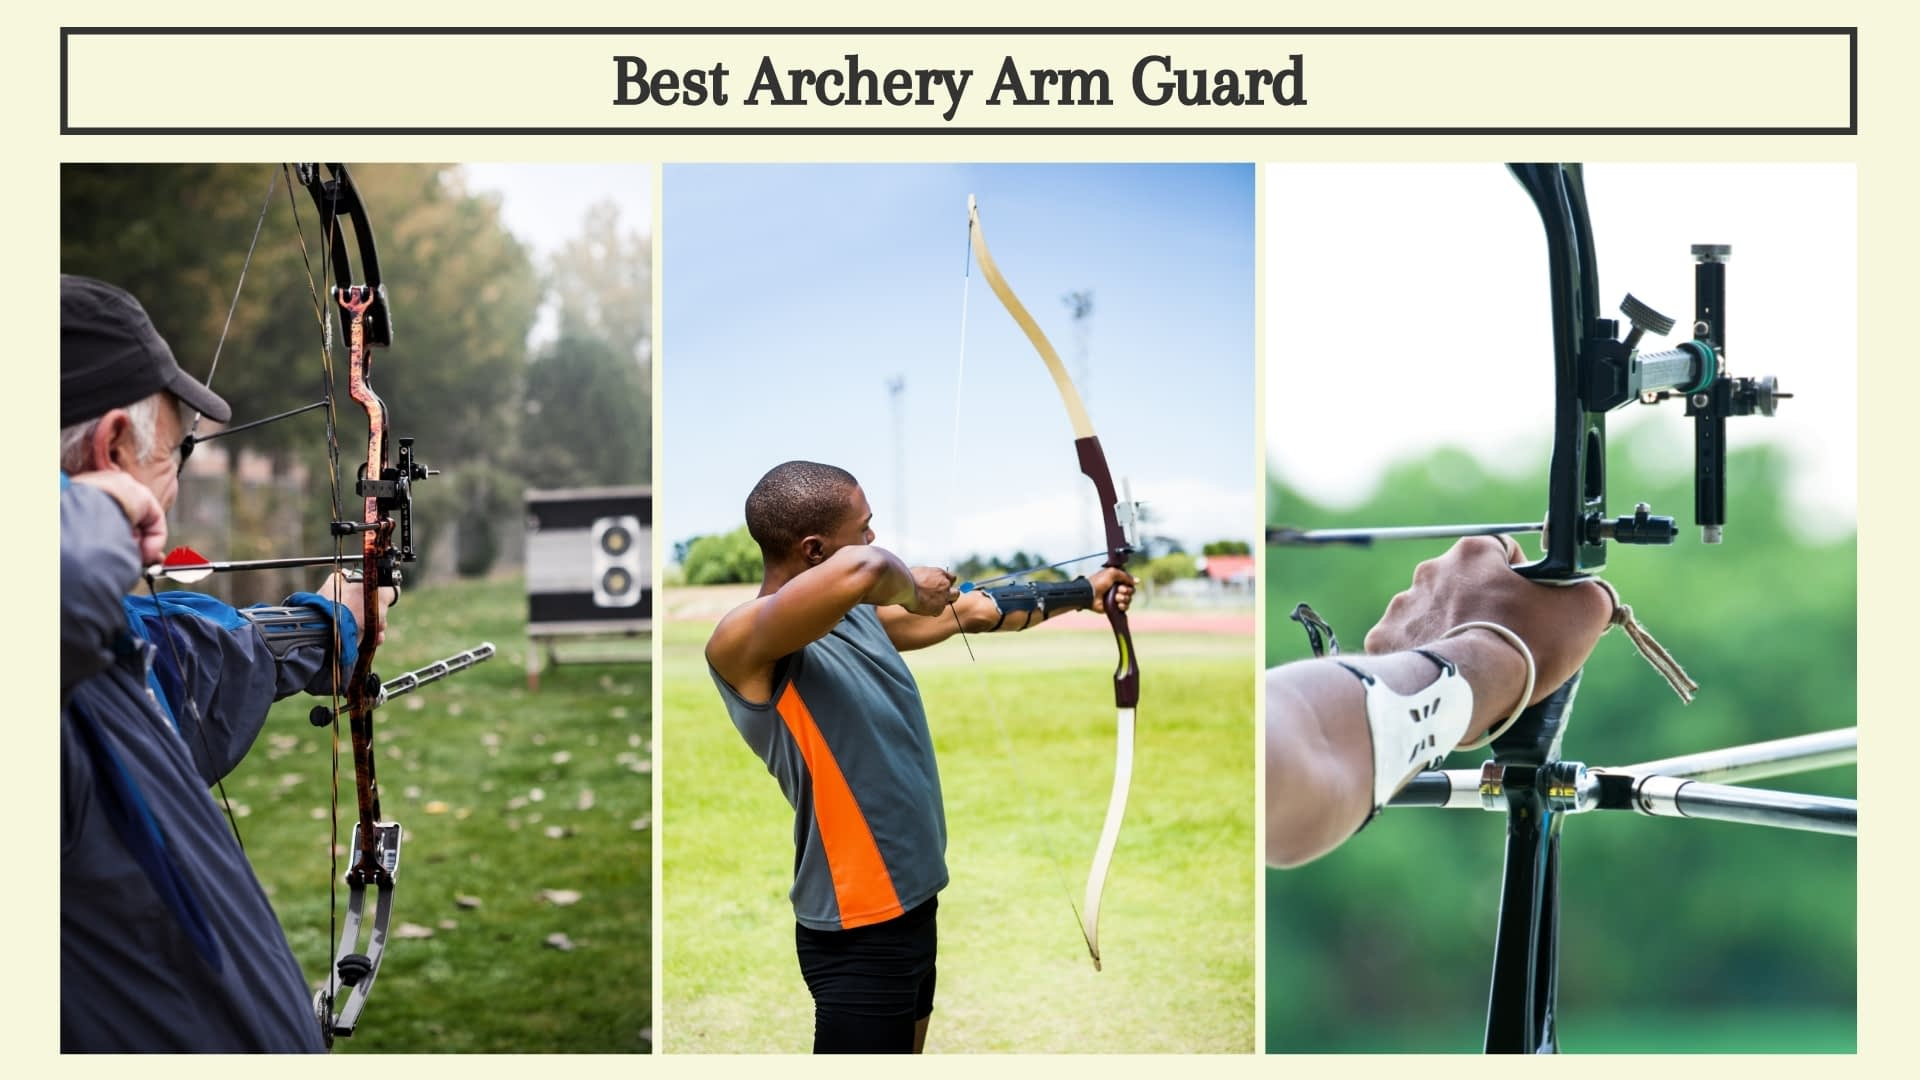 Best Archery Arm Guard